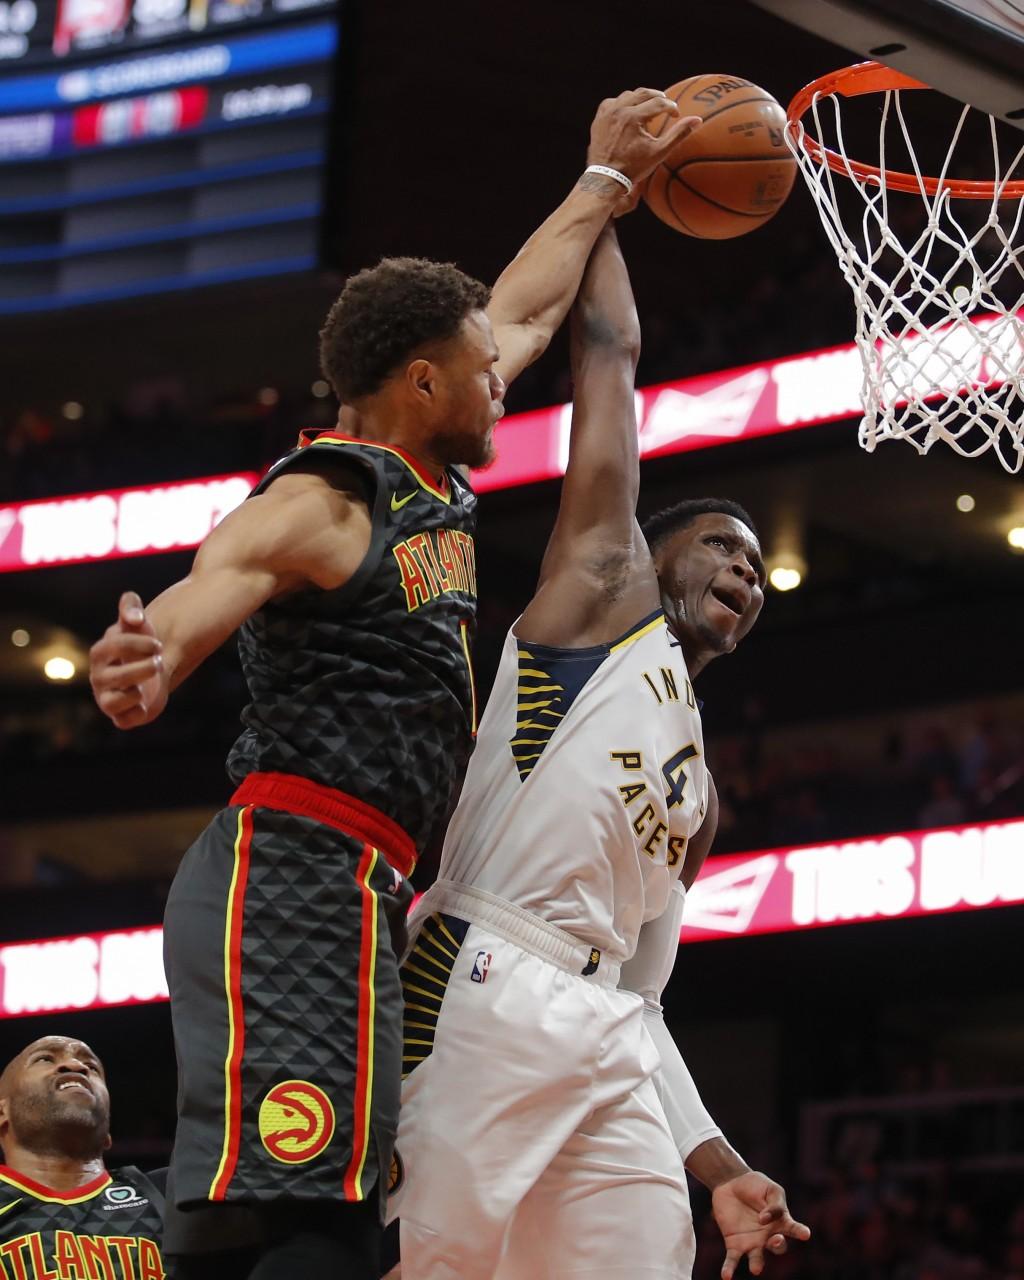 Indiana Pacers guard Victor Oladipo (4) has his shot deflected by Atlanta Hawks guard Justin Anderson (1) during the second half of an NBA basketball ...